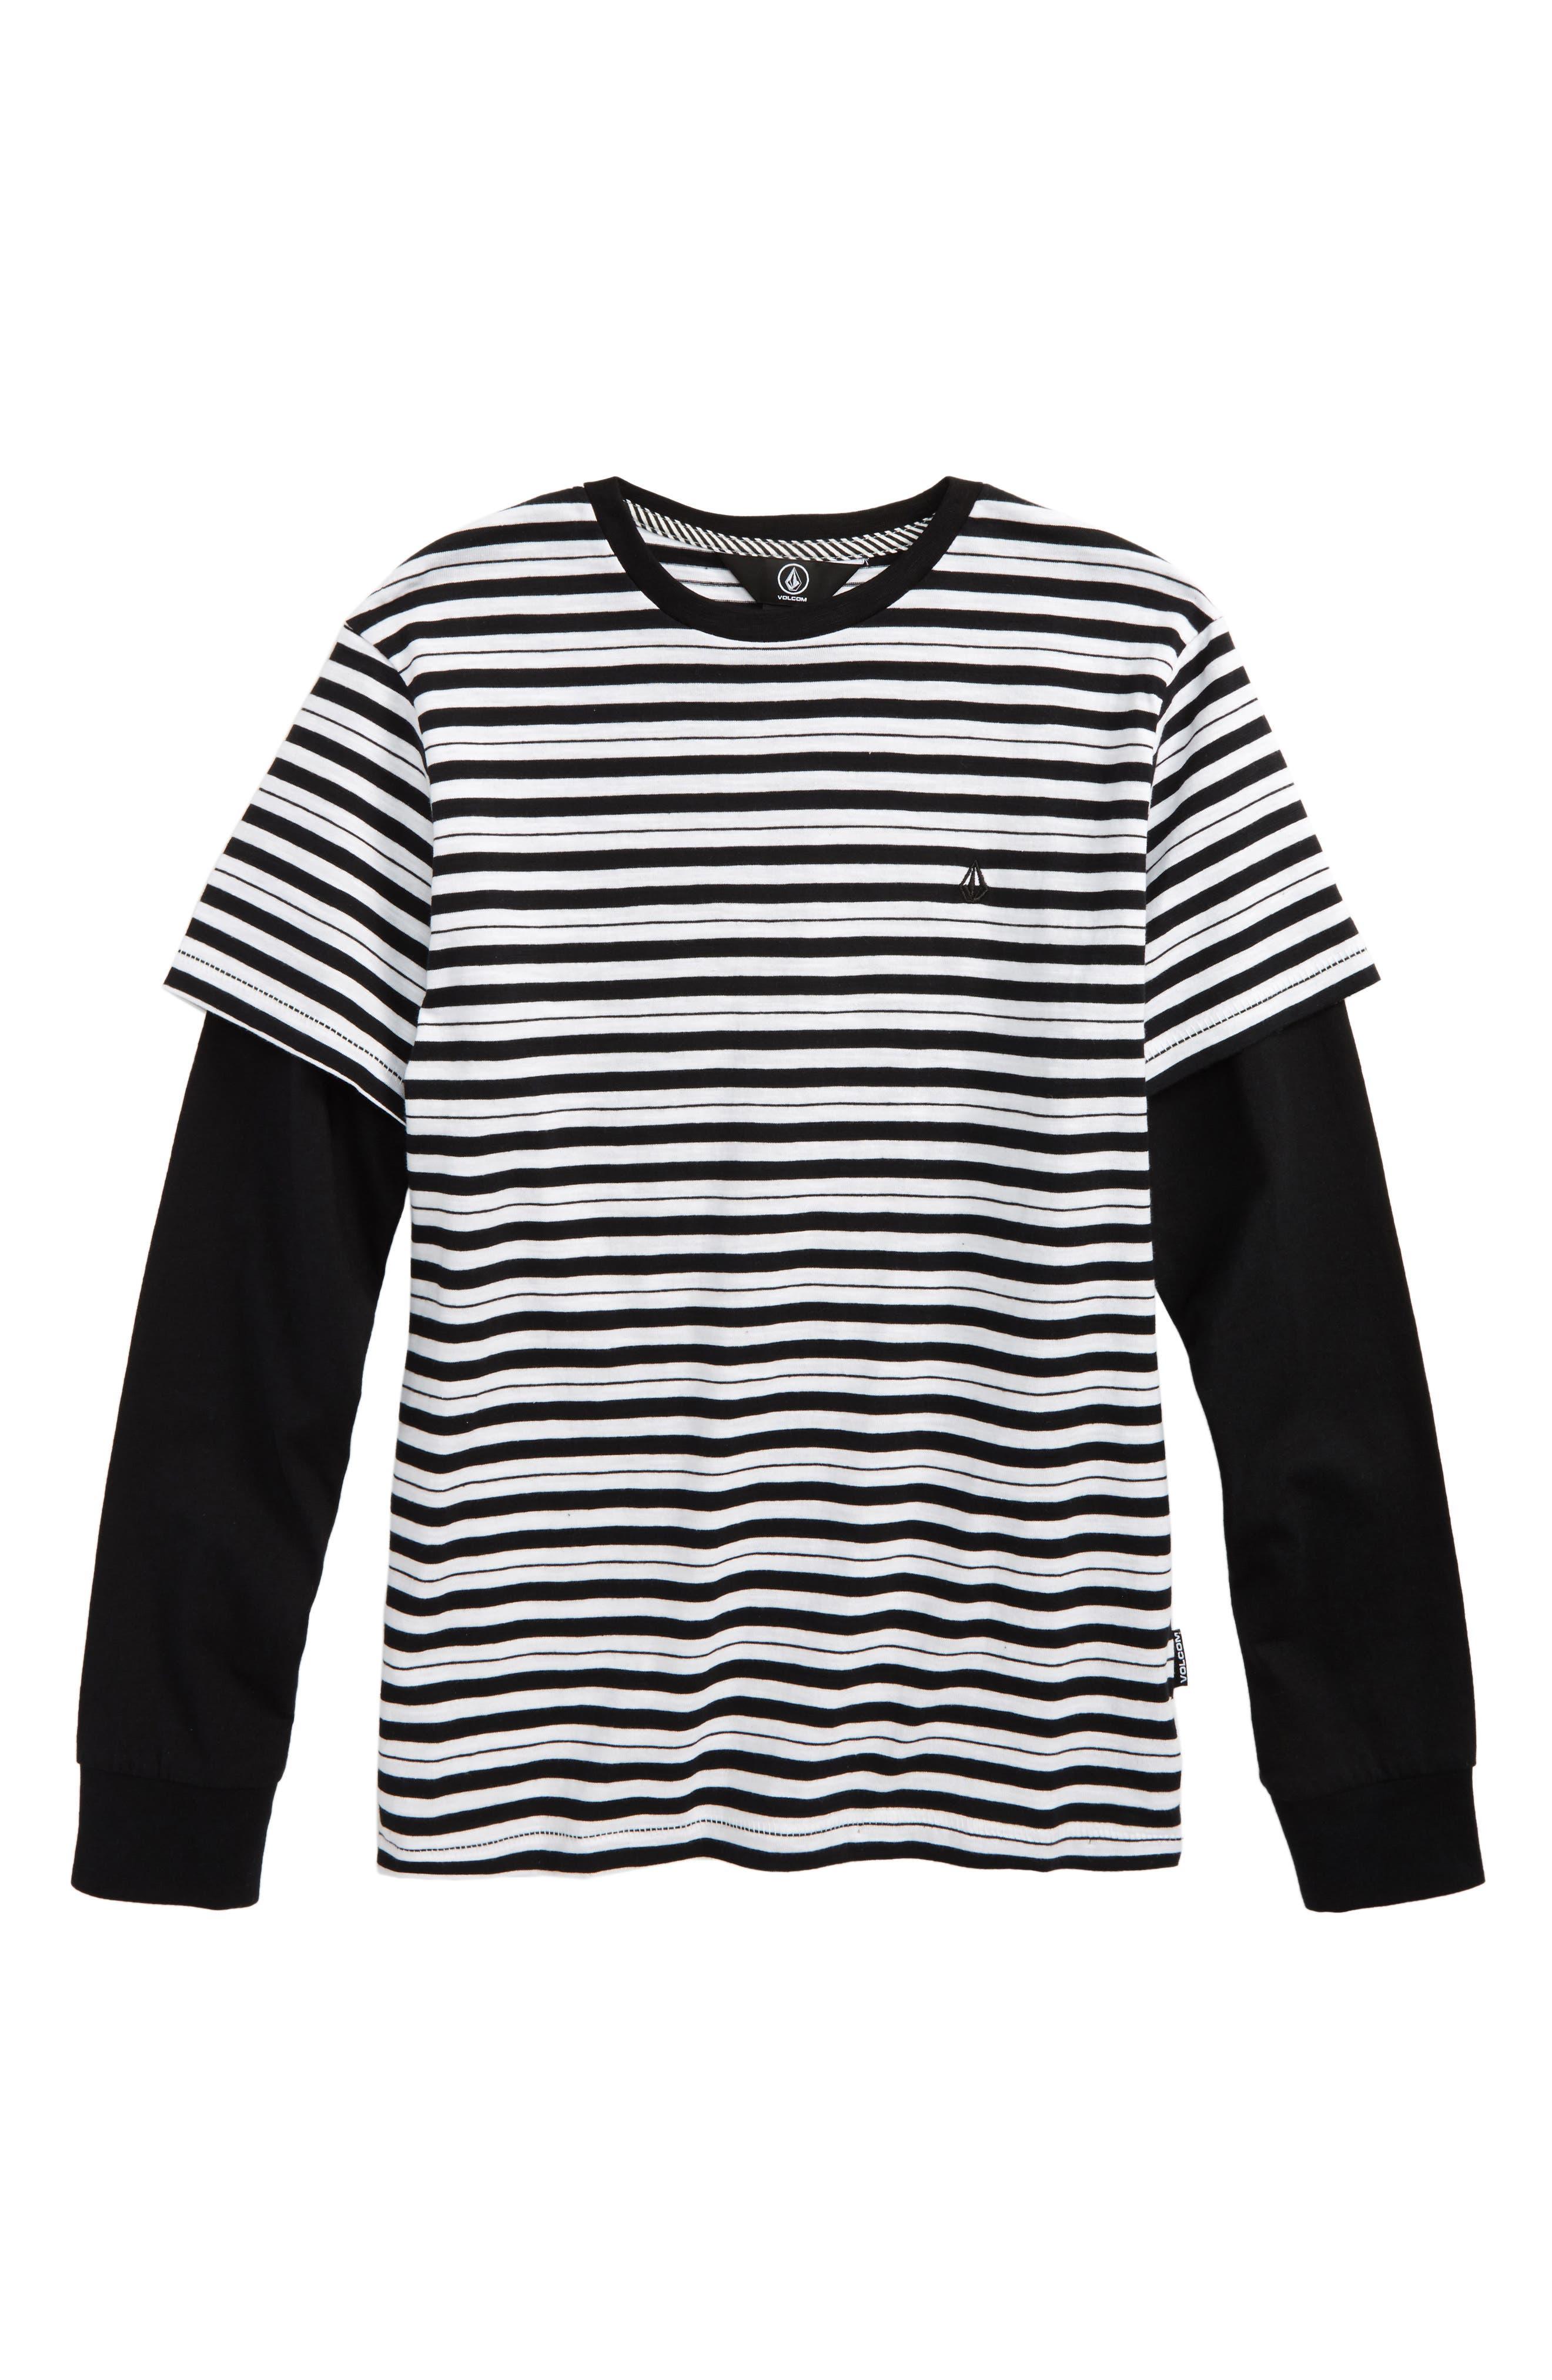 Impact Twofer Layered T-Shirt,                             Main thumbnail 1, color,                             White